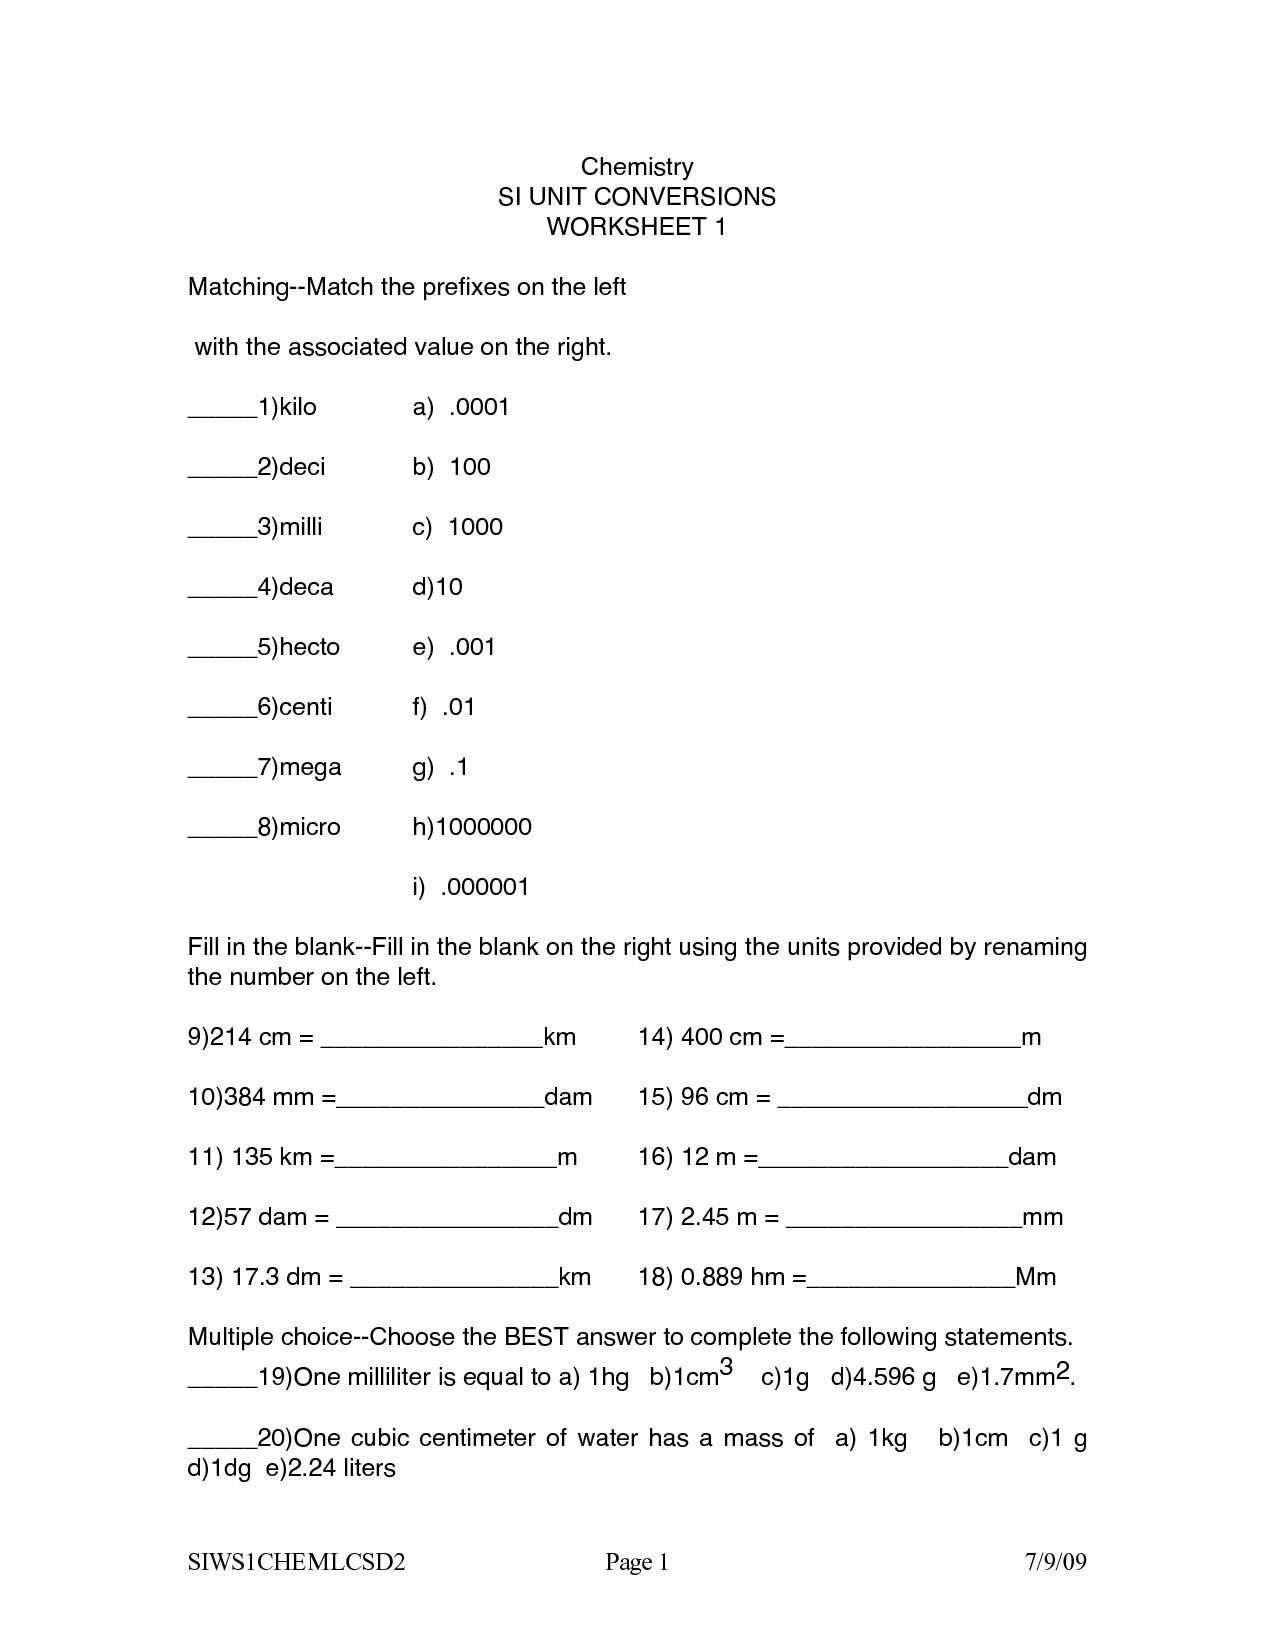 15 Best Images Of Chemistry Unit 5 Worksheet 1